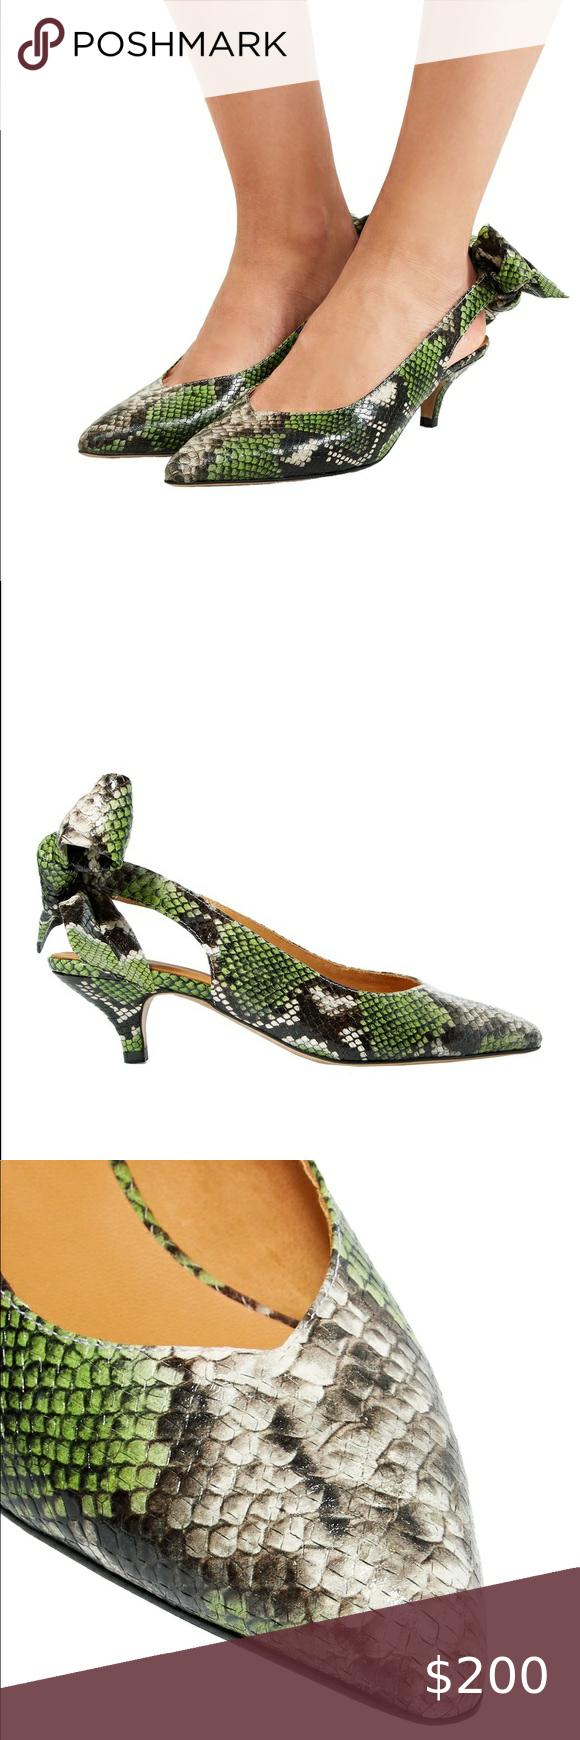 Ganni Green Sabine Snake Leather Sling Back Pump 7 In 2020 Snake Leather Shoes Women Heels Printed Leather